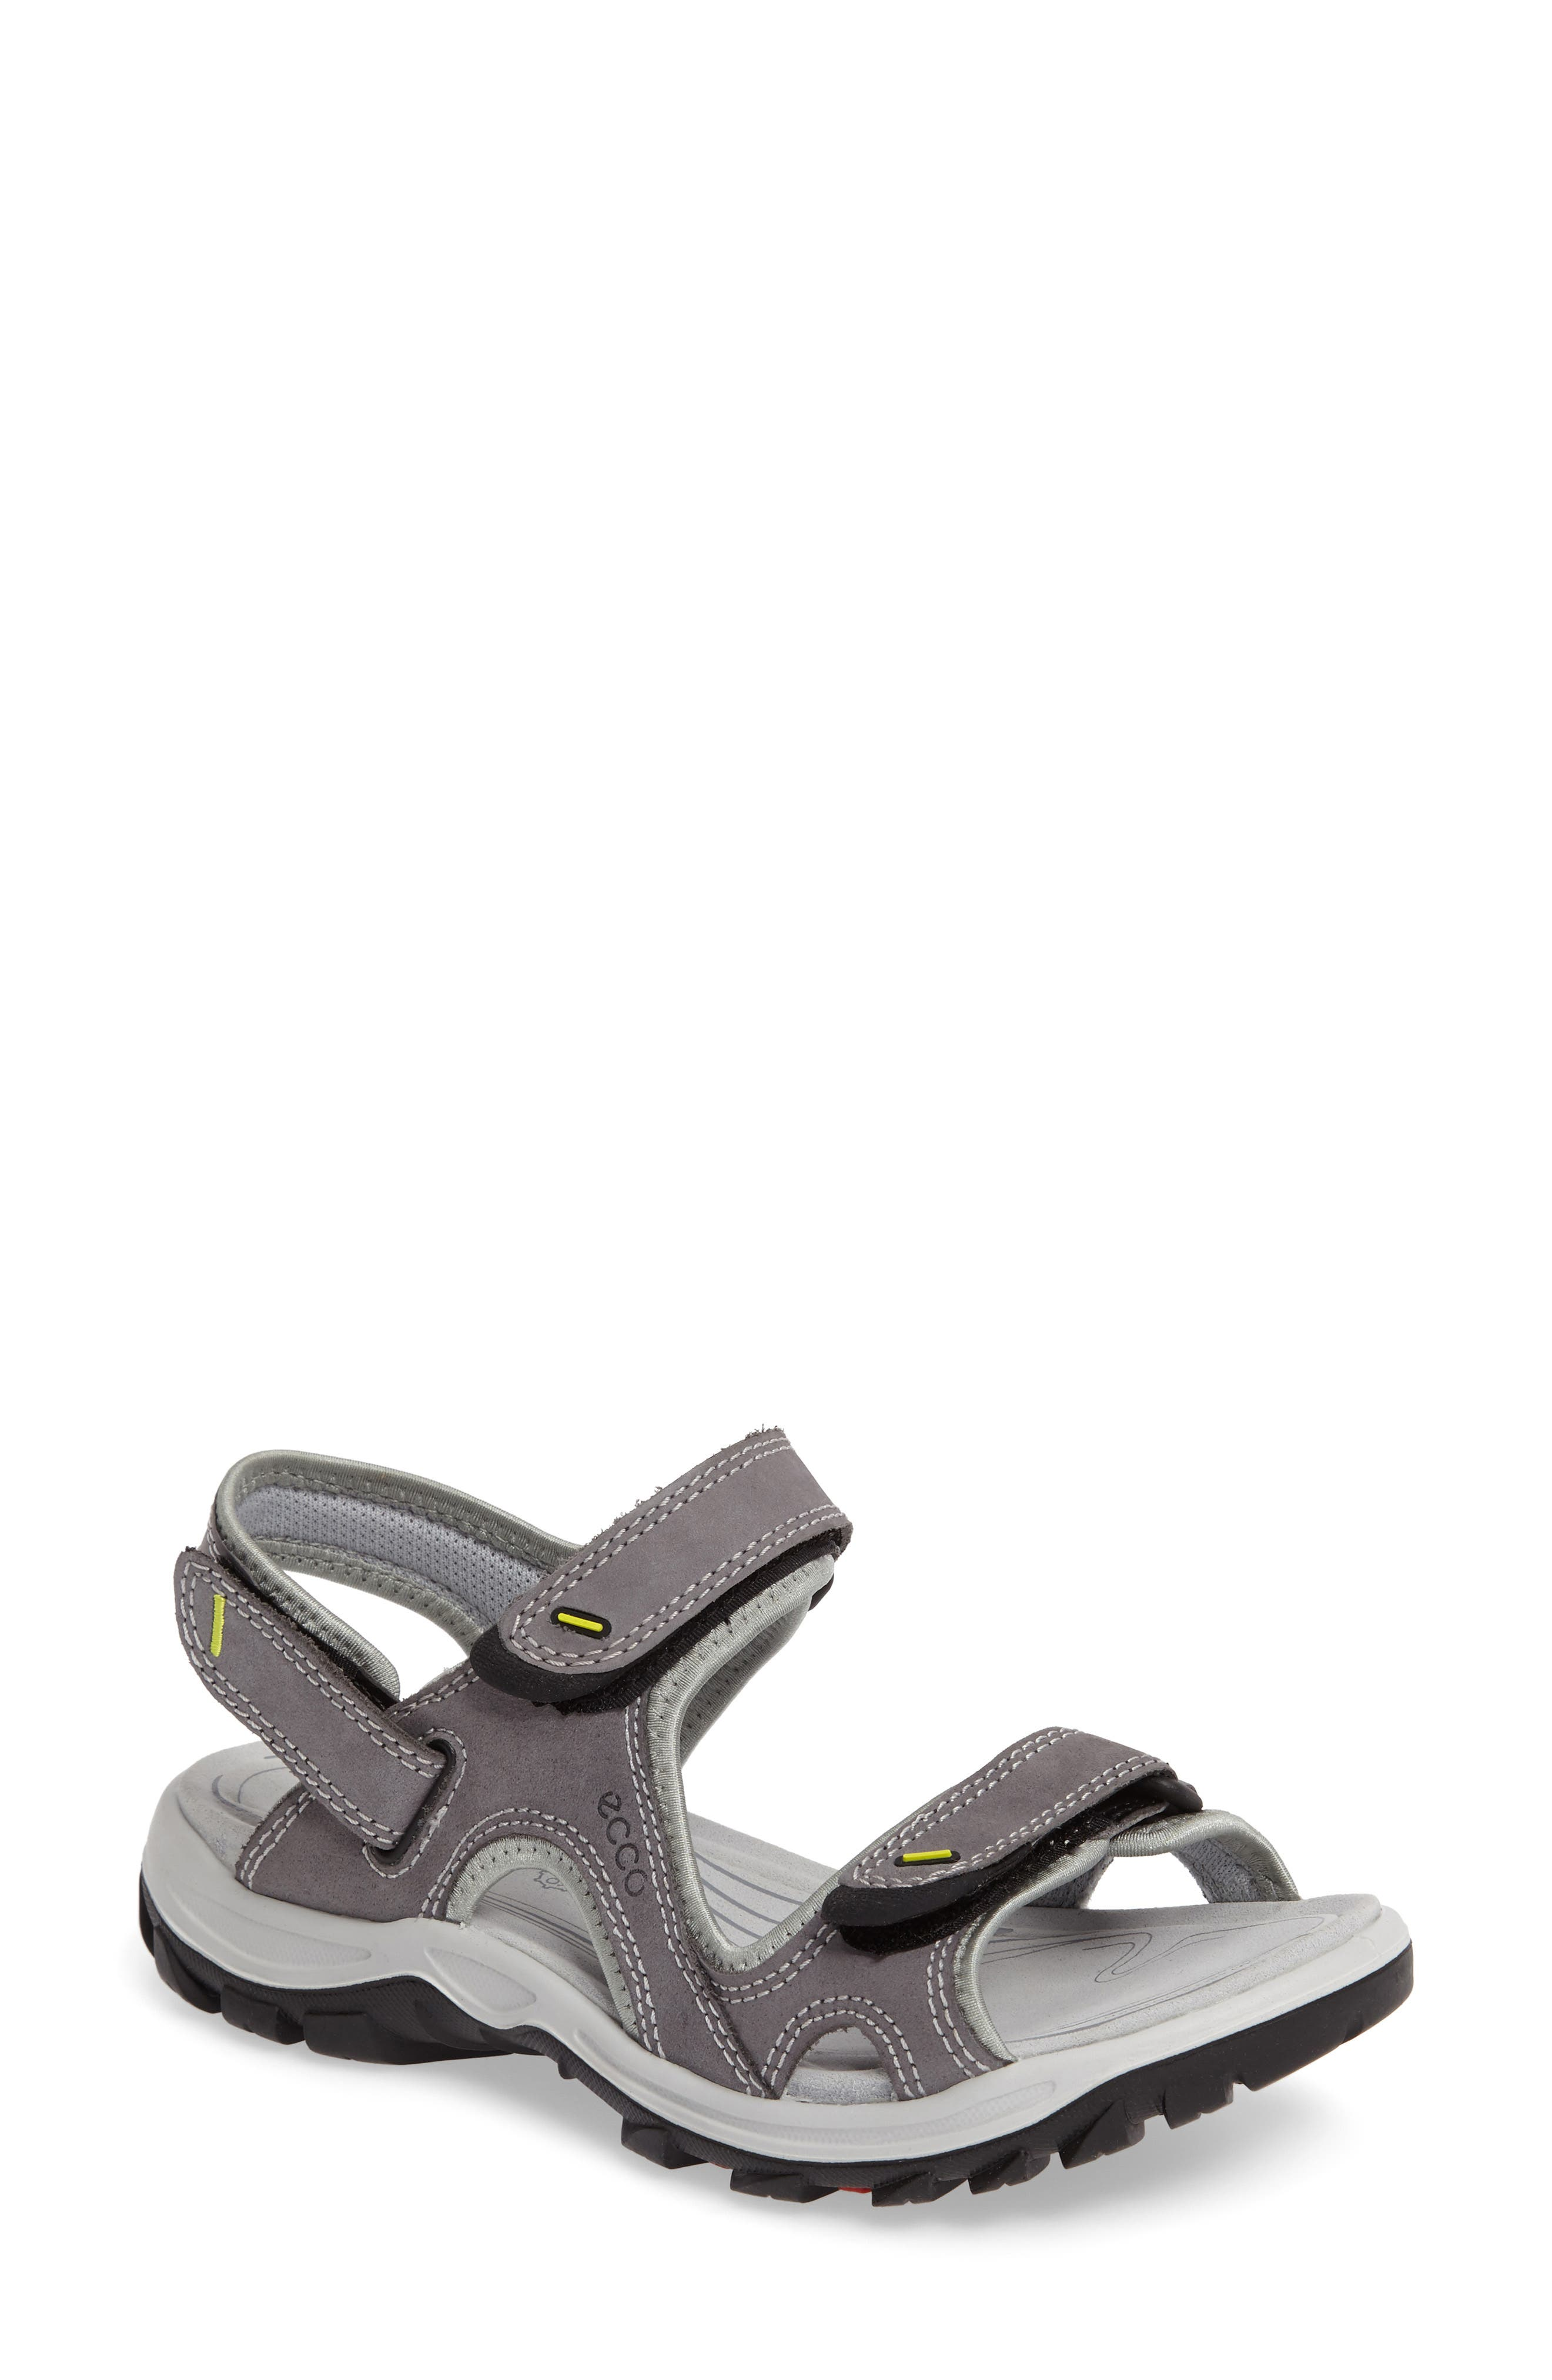 ECCO Offroad Lightweight Sandal